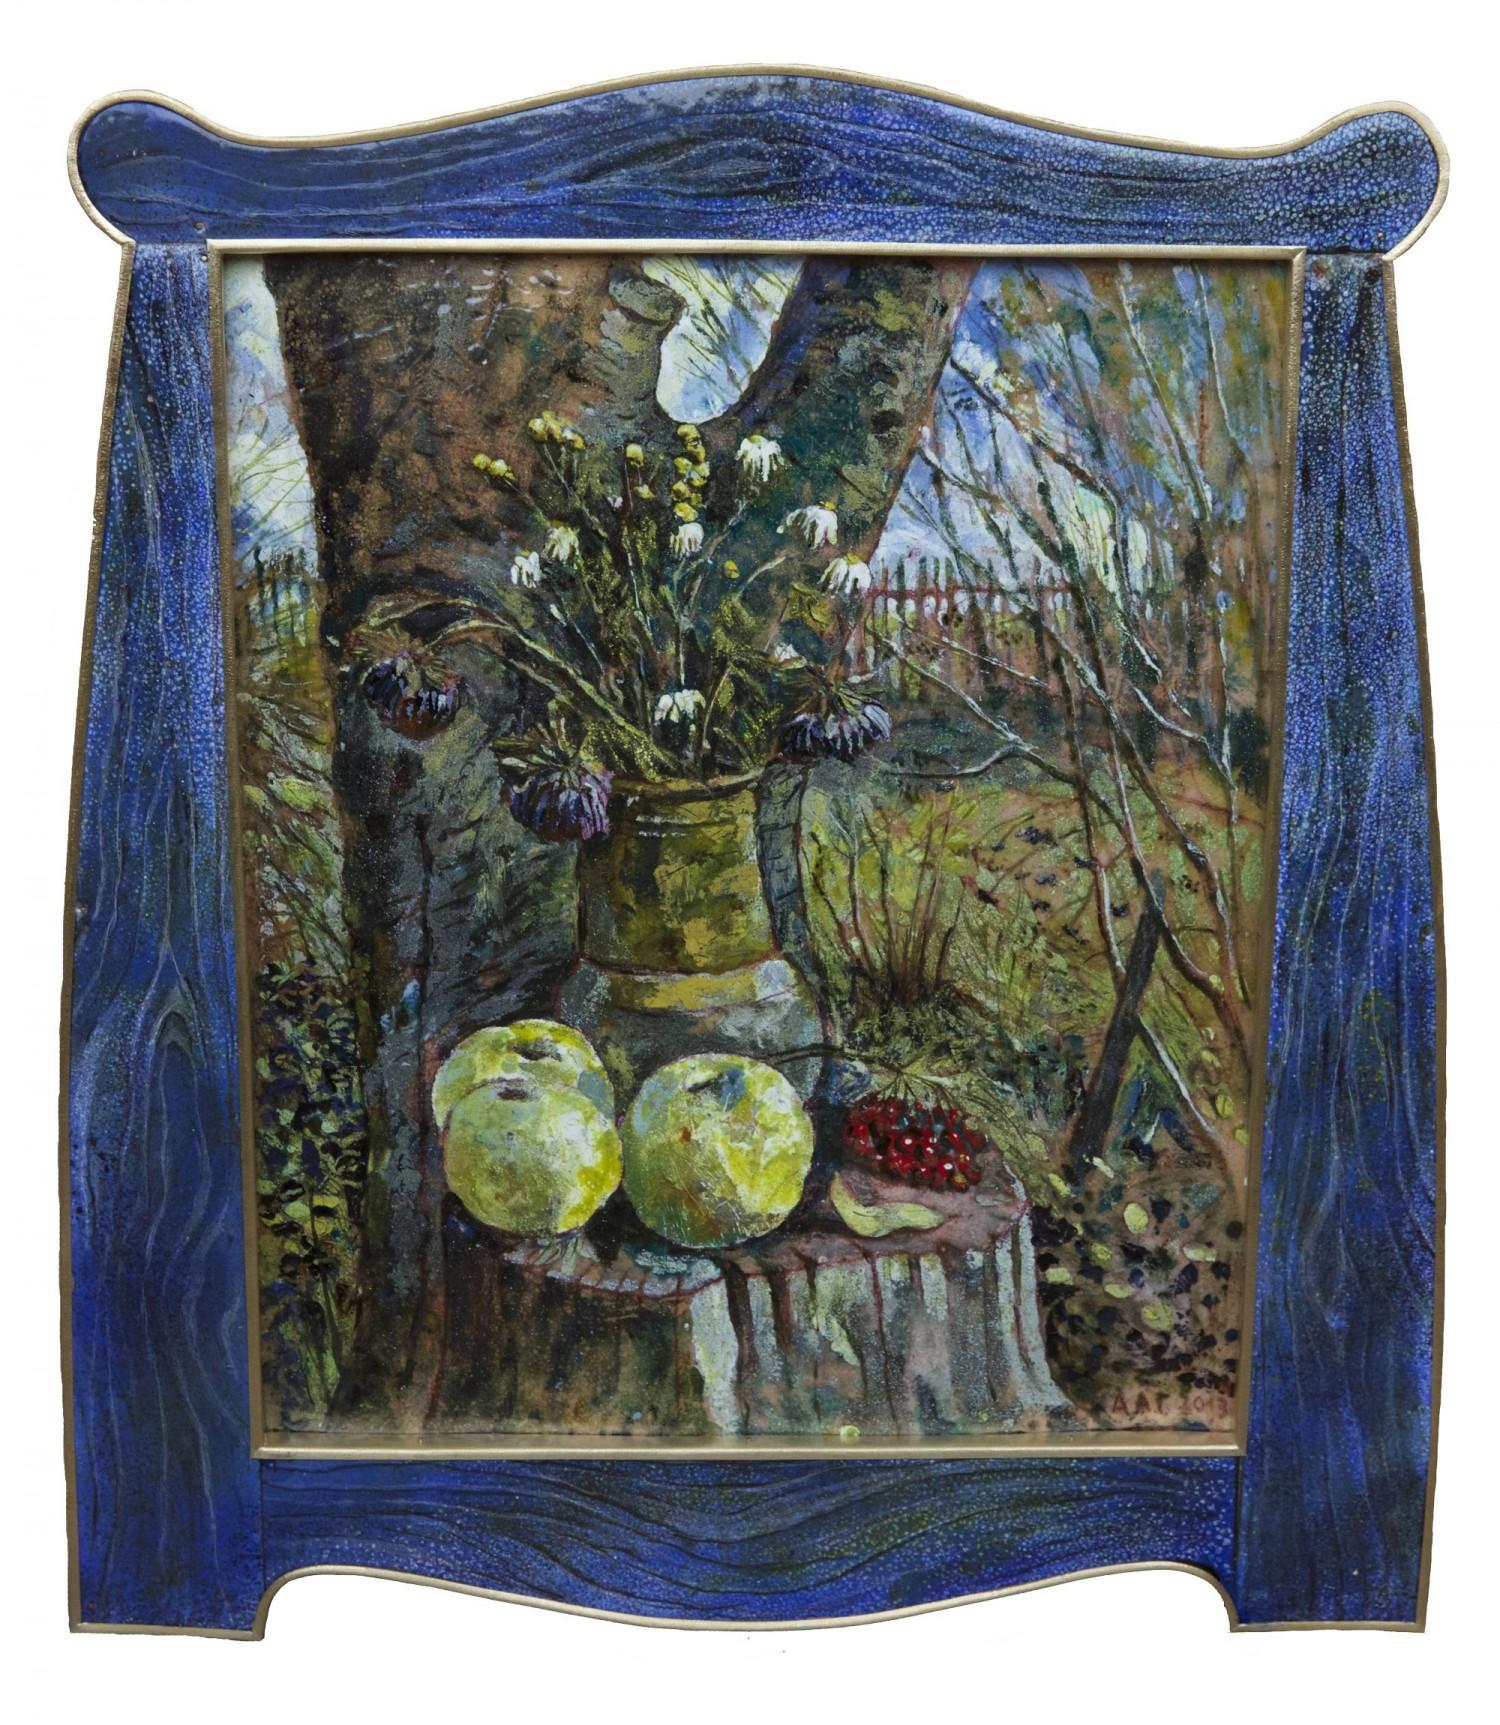 А.Г.Алексеев. Натюрморт у рябины. Село Скнятиново. 2013. 57х51. Коллекция Д.Волкова.